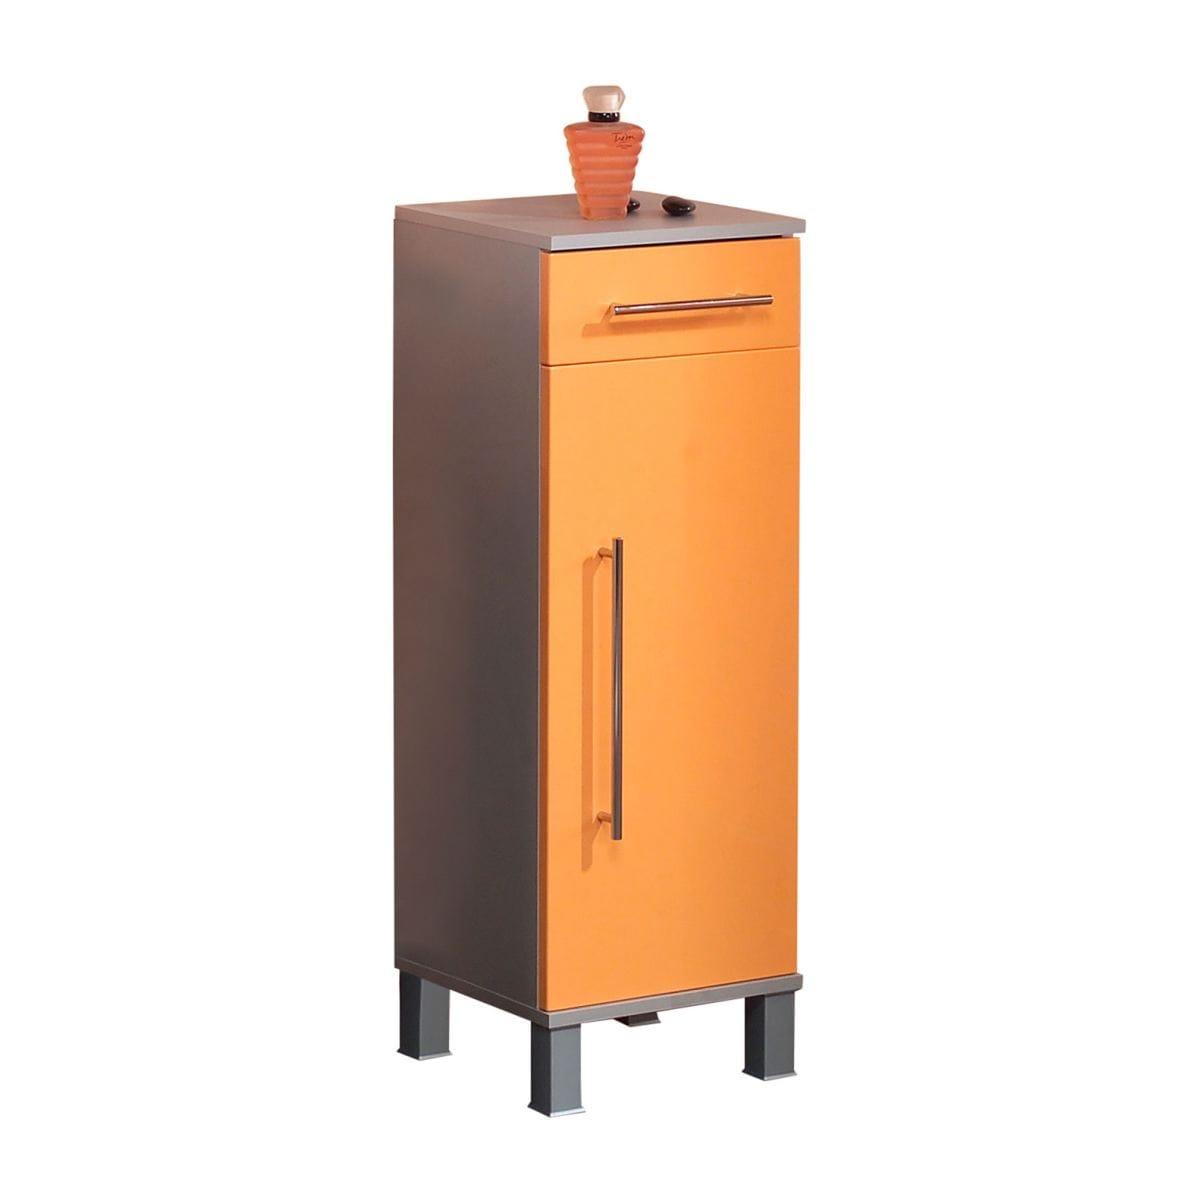 unterschrank orange hochglanz ca 32 5 x 96 x 31 5 cm porta. Black Bedroom Furniture Sets. Home Design Ideas